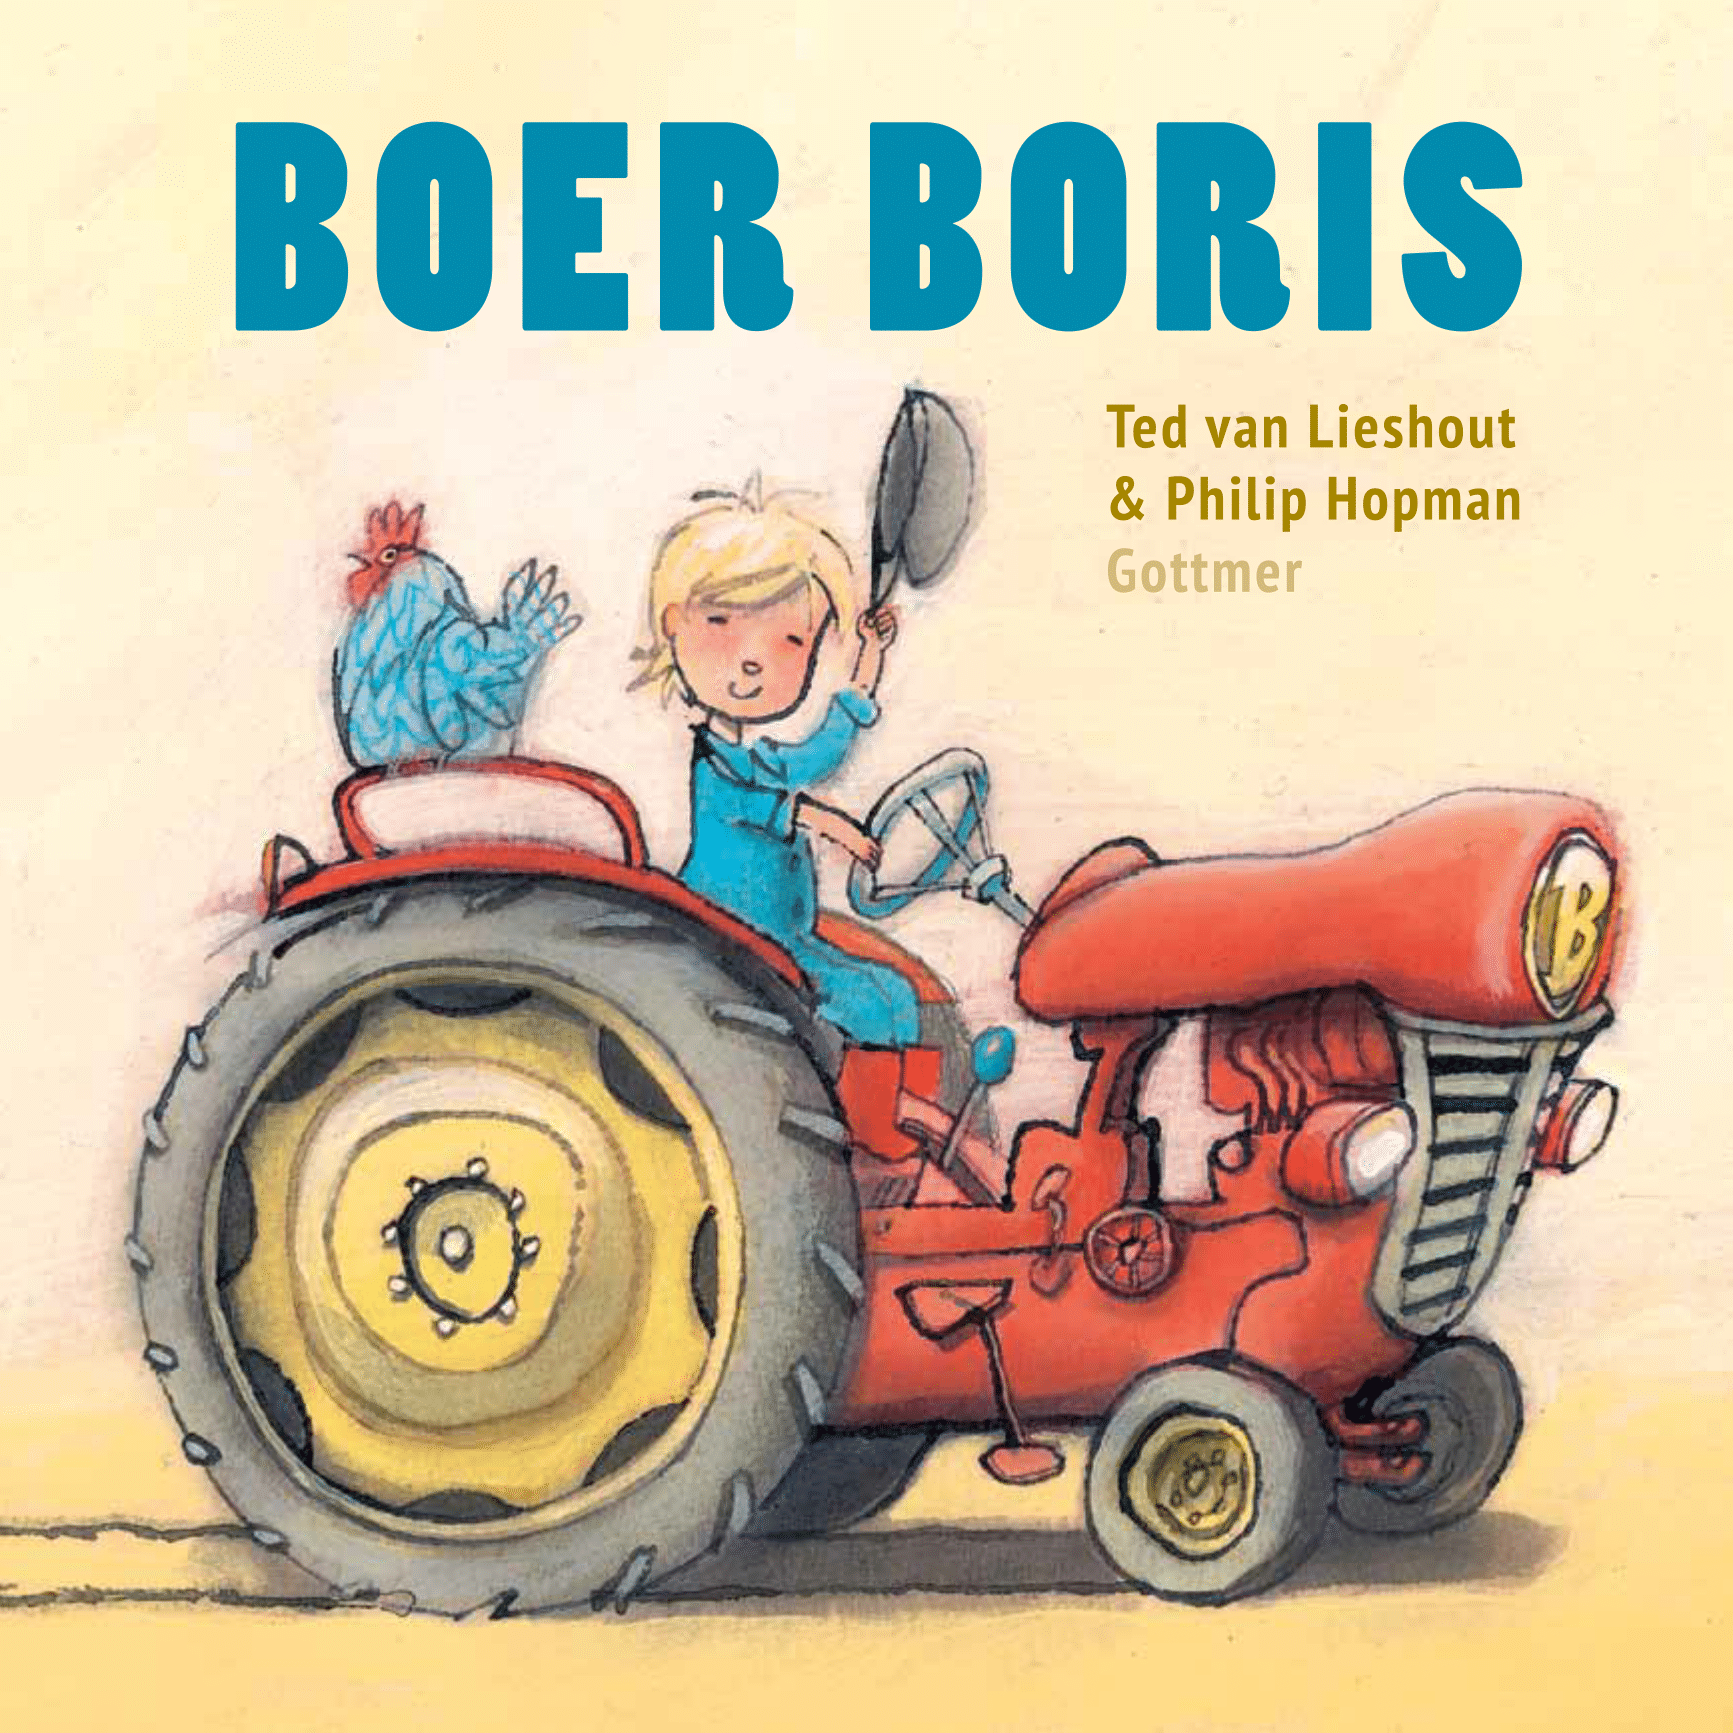 boerboris01C-1-1